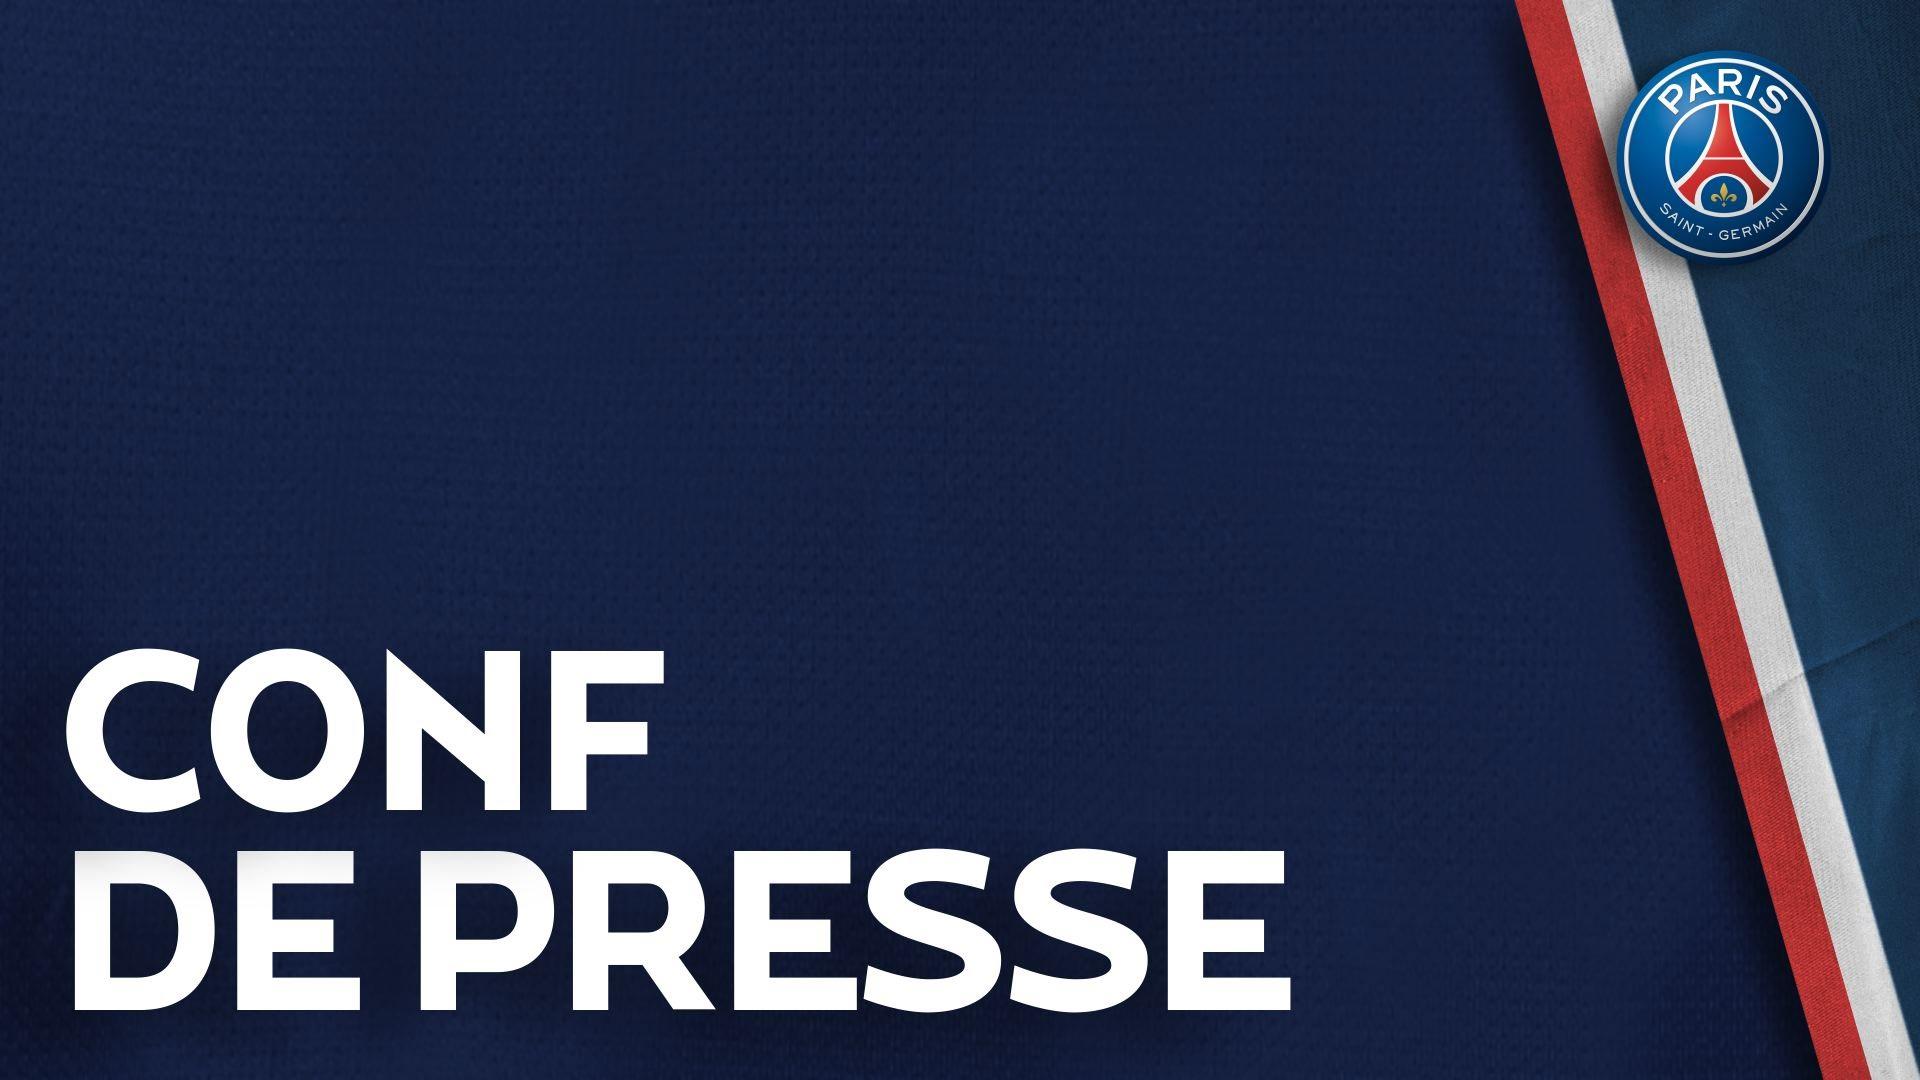 Conférence de presse de Laurent Blanc et de Salvatore Sirigu